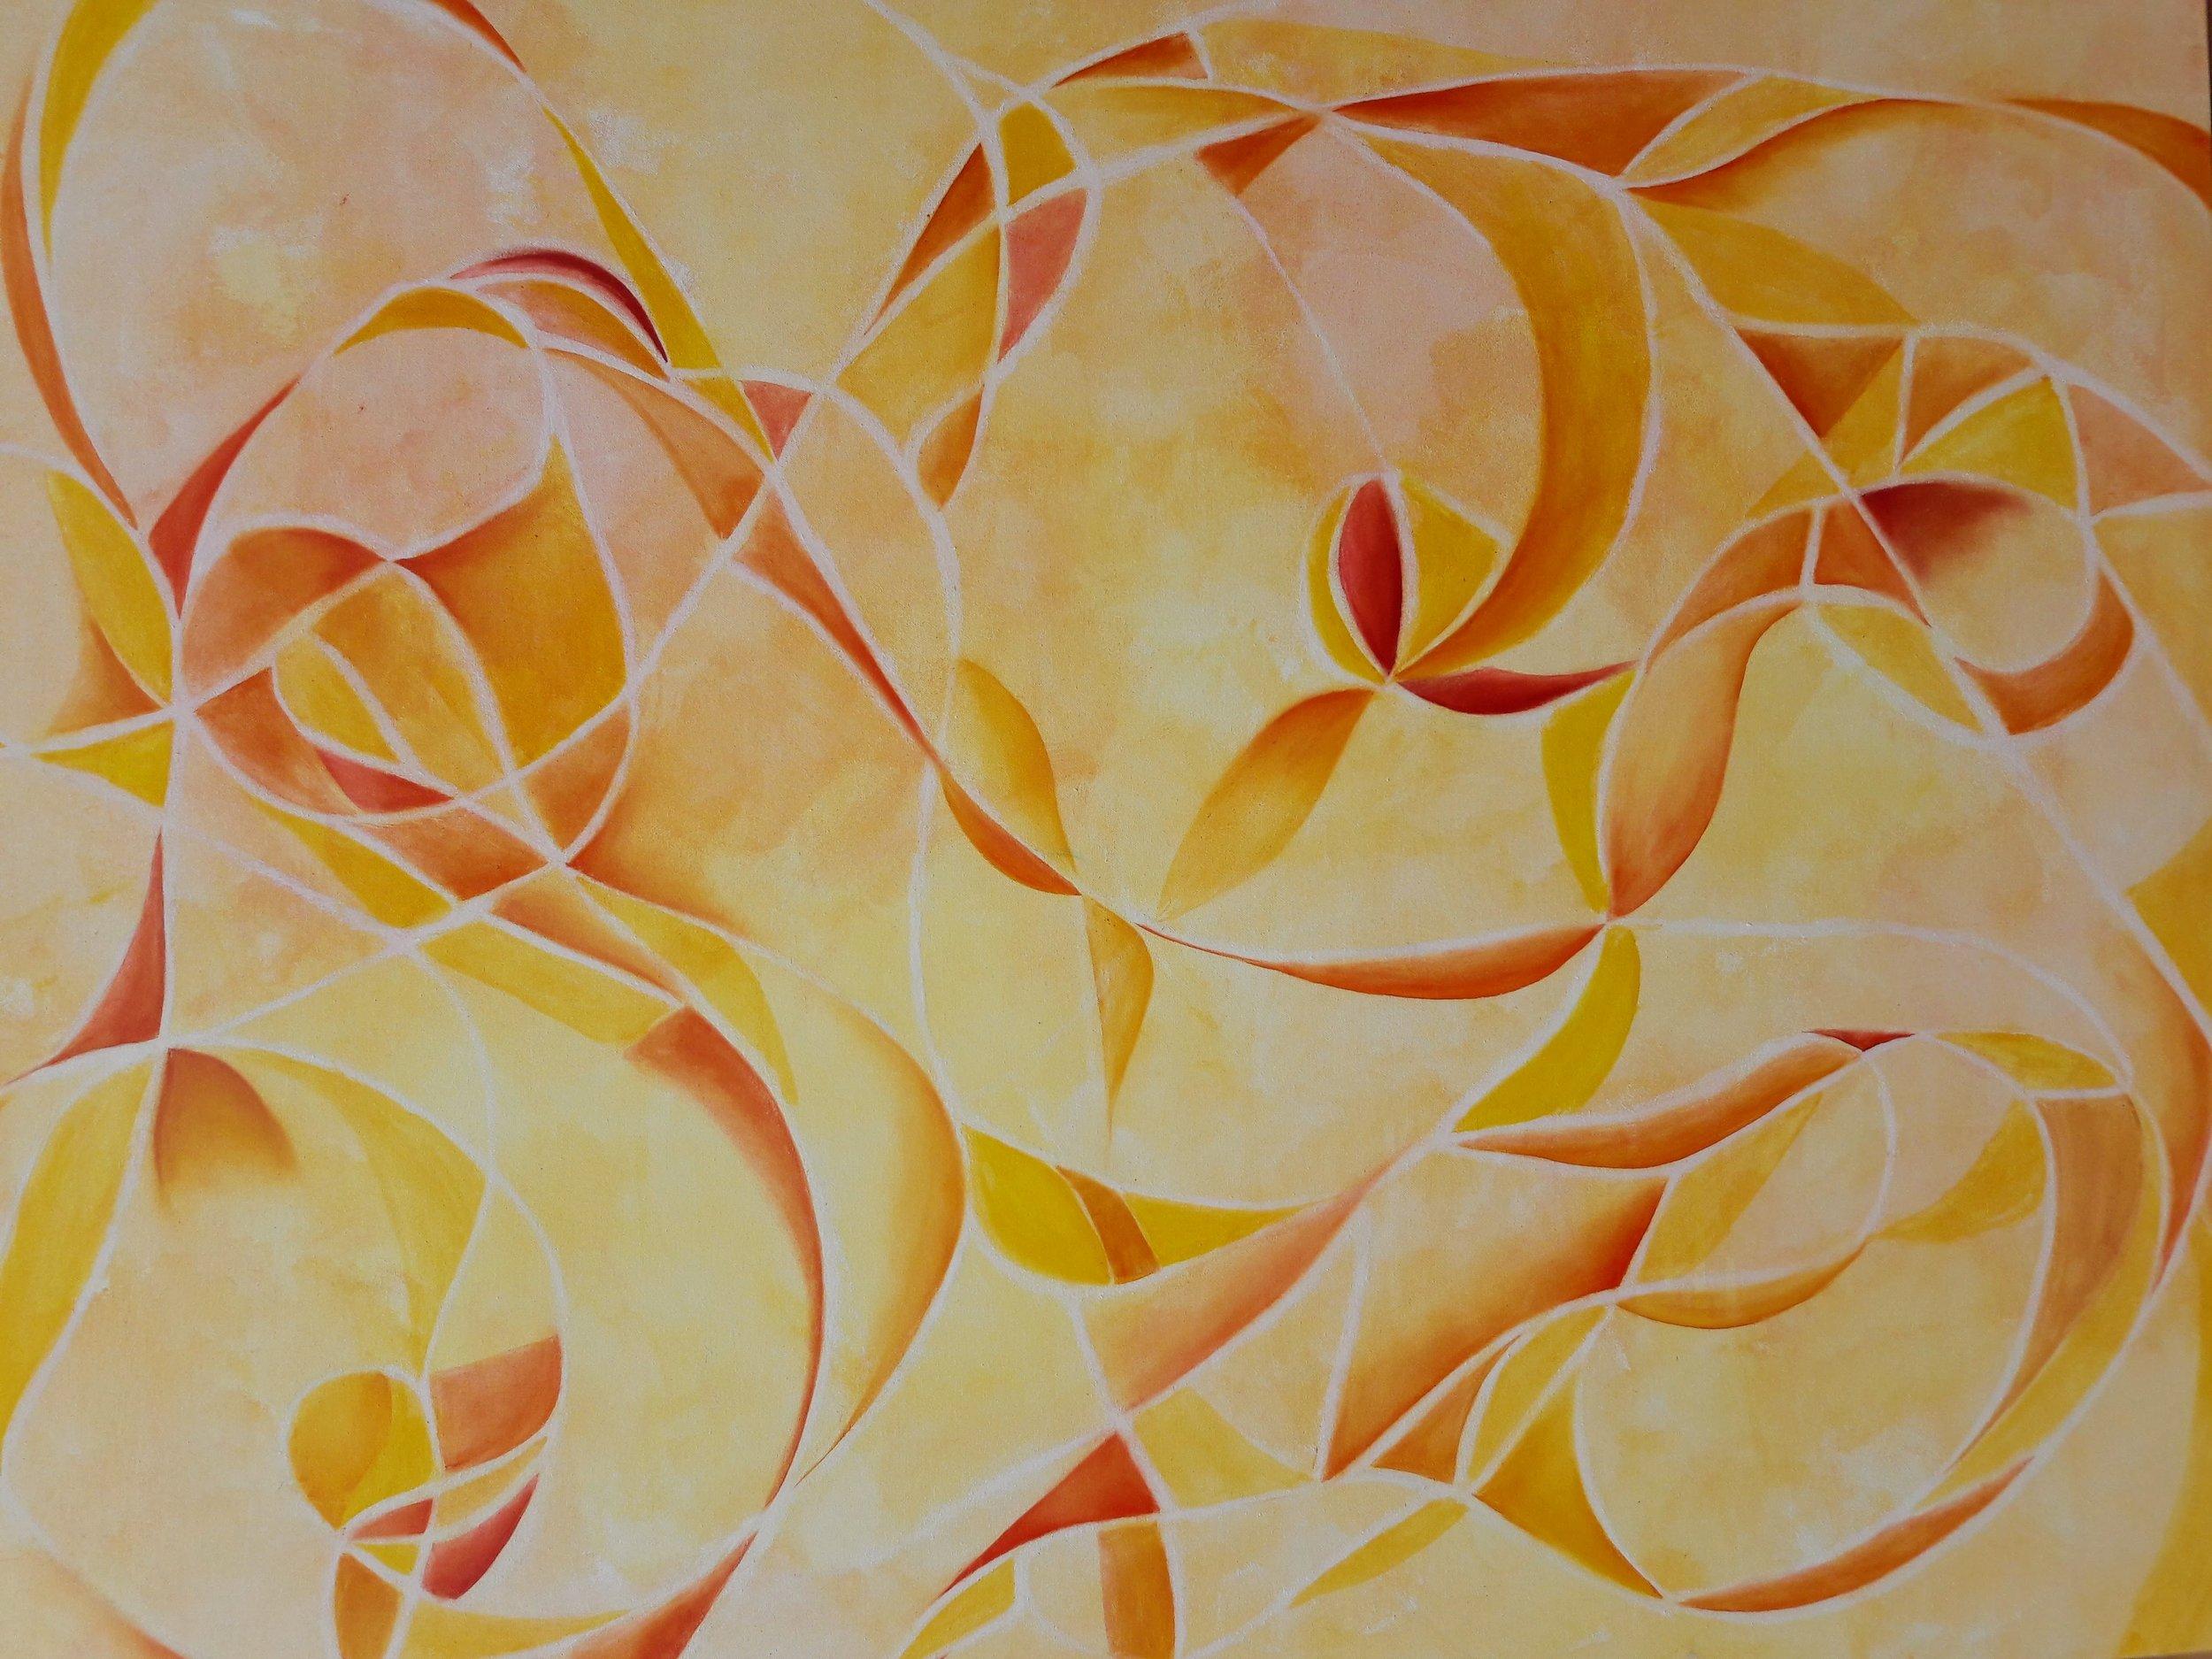 Danza de Verano  Mixta/Tela  100 x 80 cm